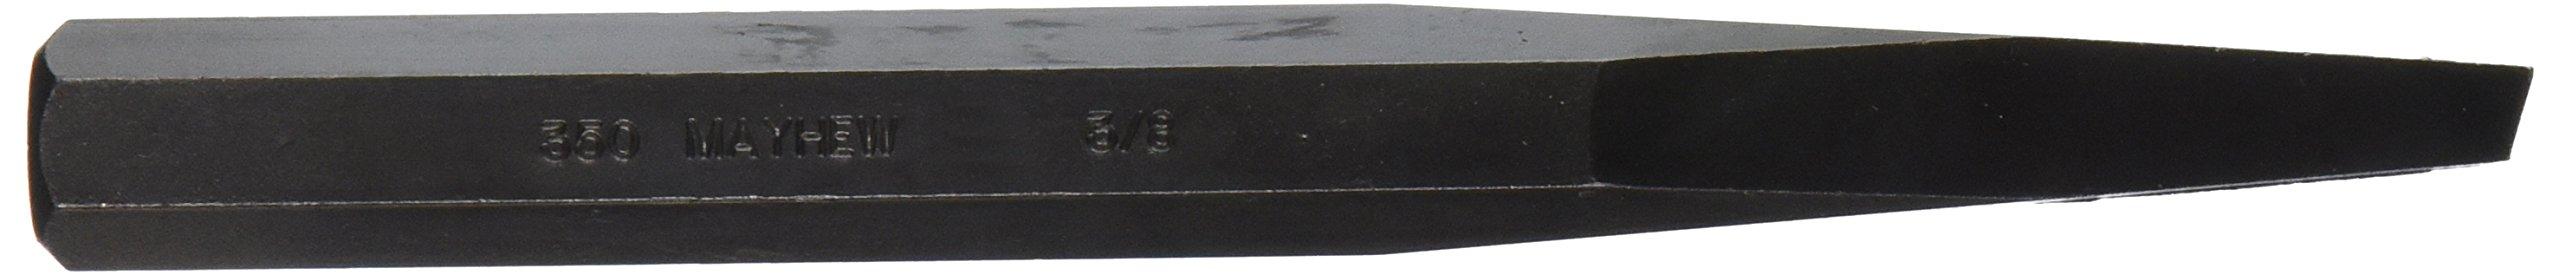 Mayhew Pro 10604 3/8-Inch Reg Diamond Point Chisel